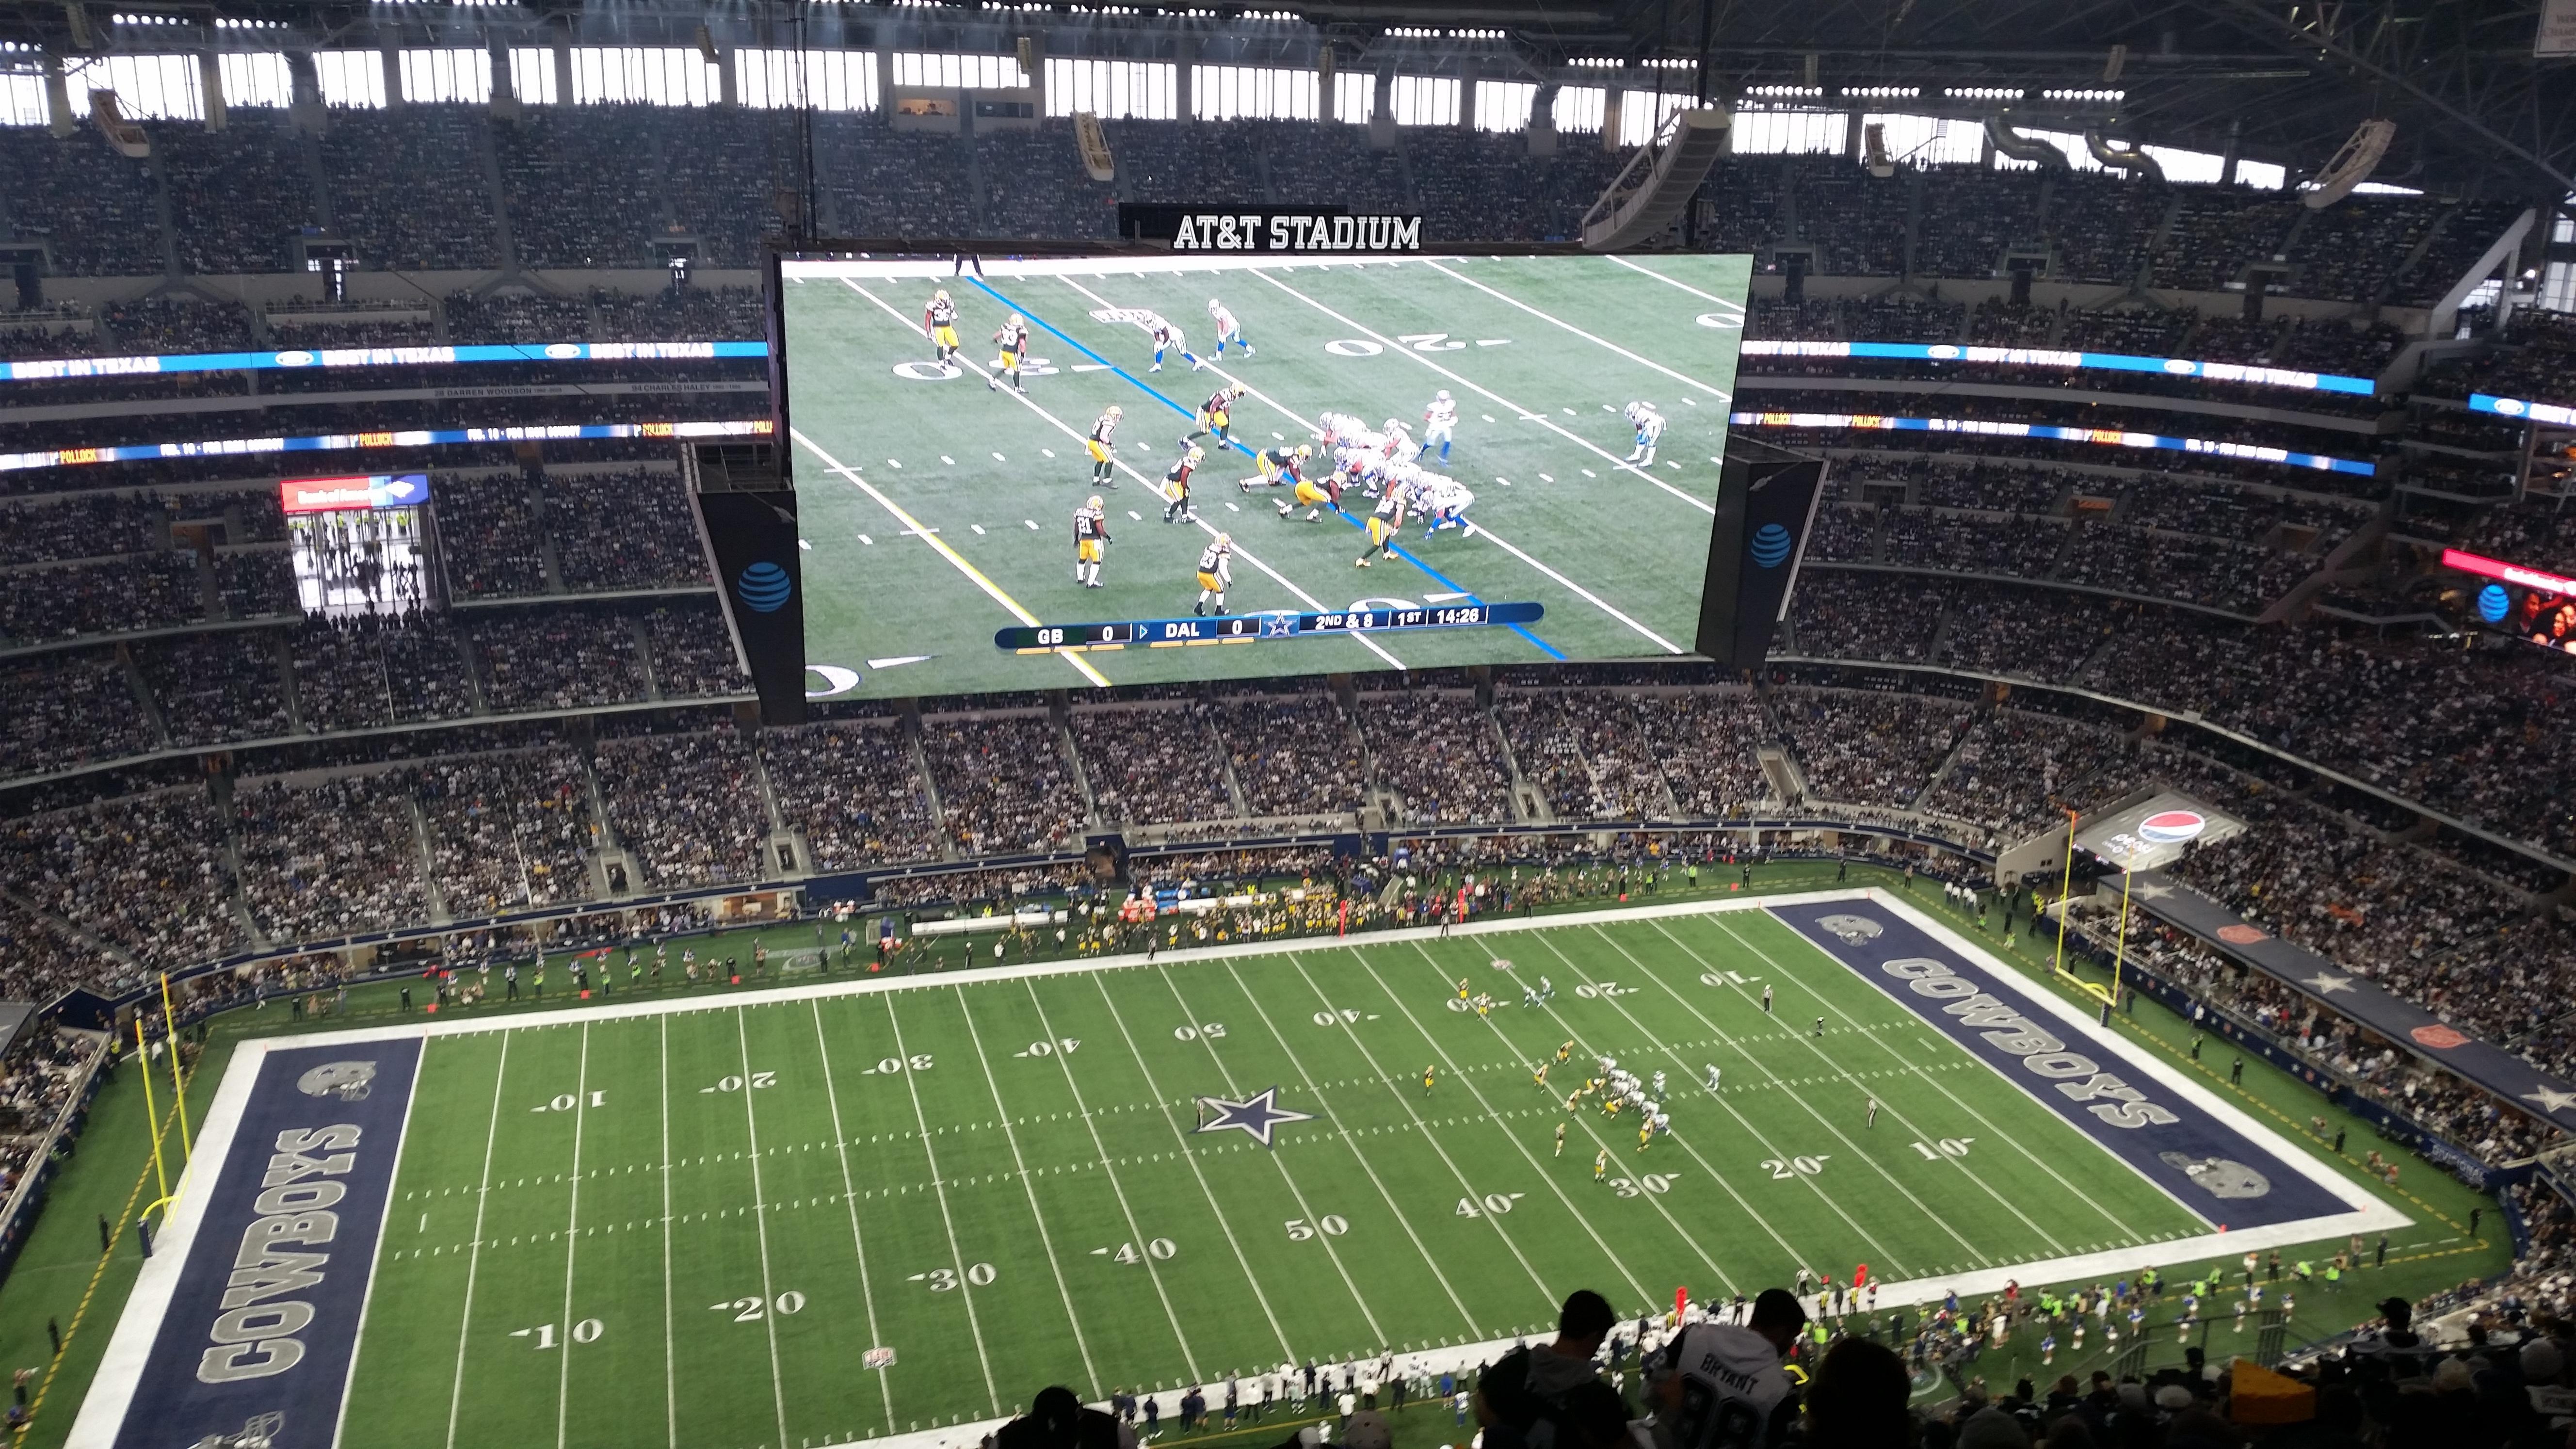 AT&T Stadium Secção 415 Fila 29 Lugar 2